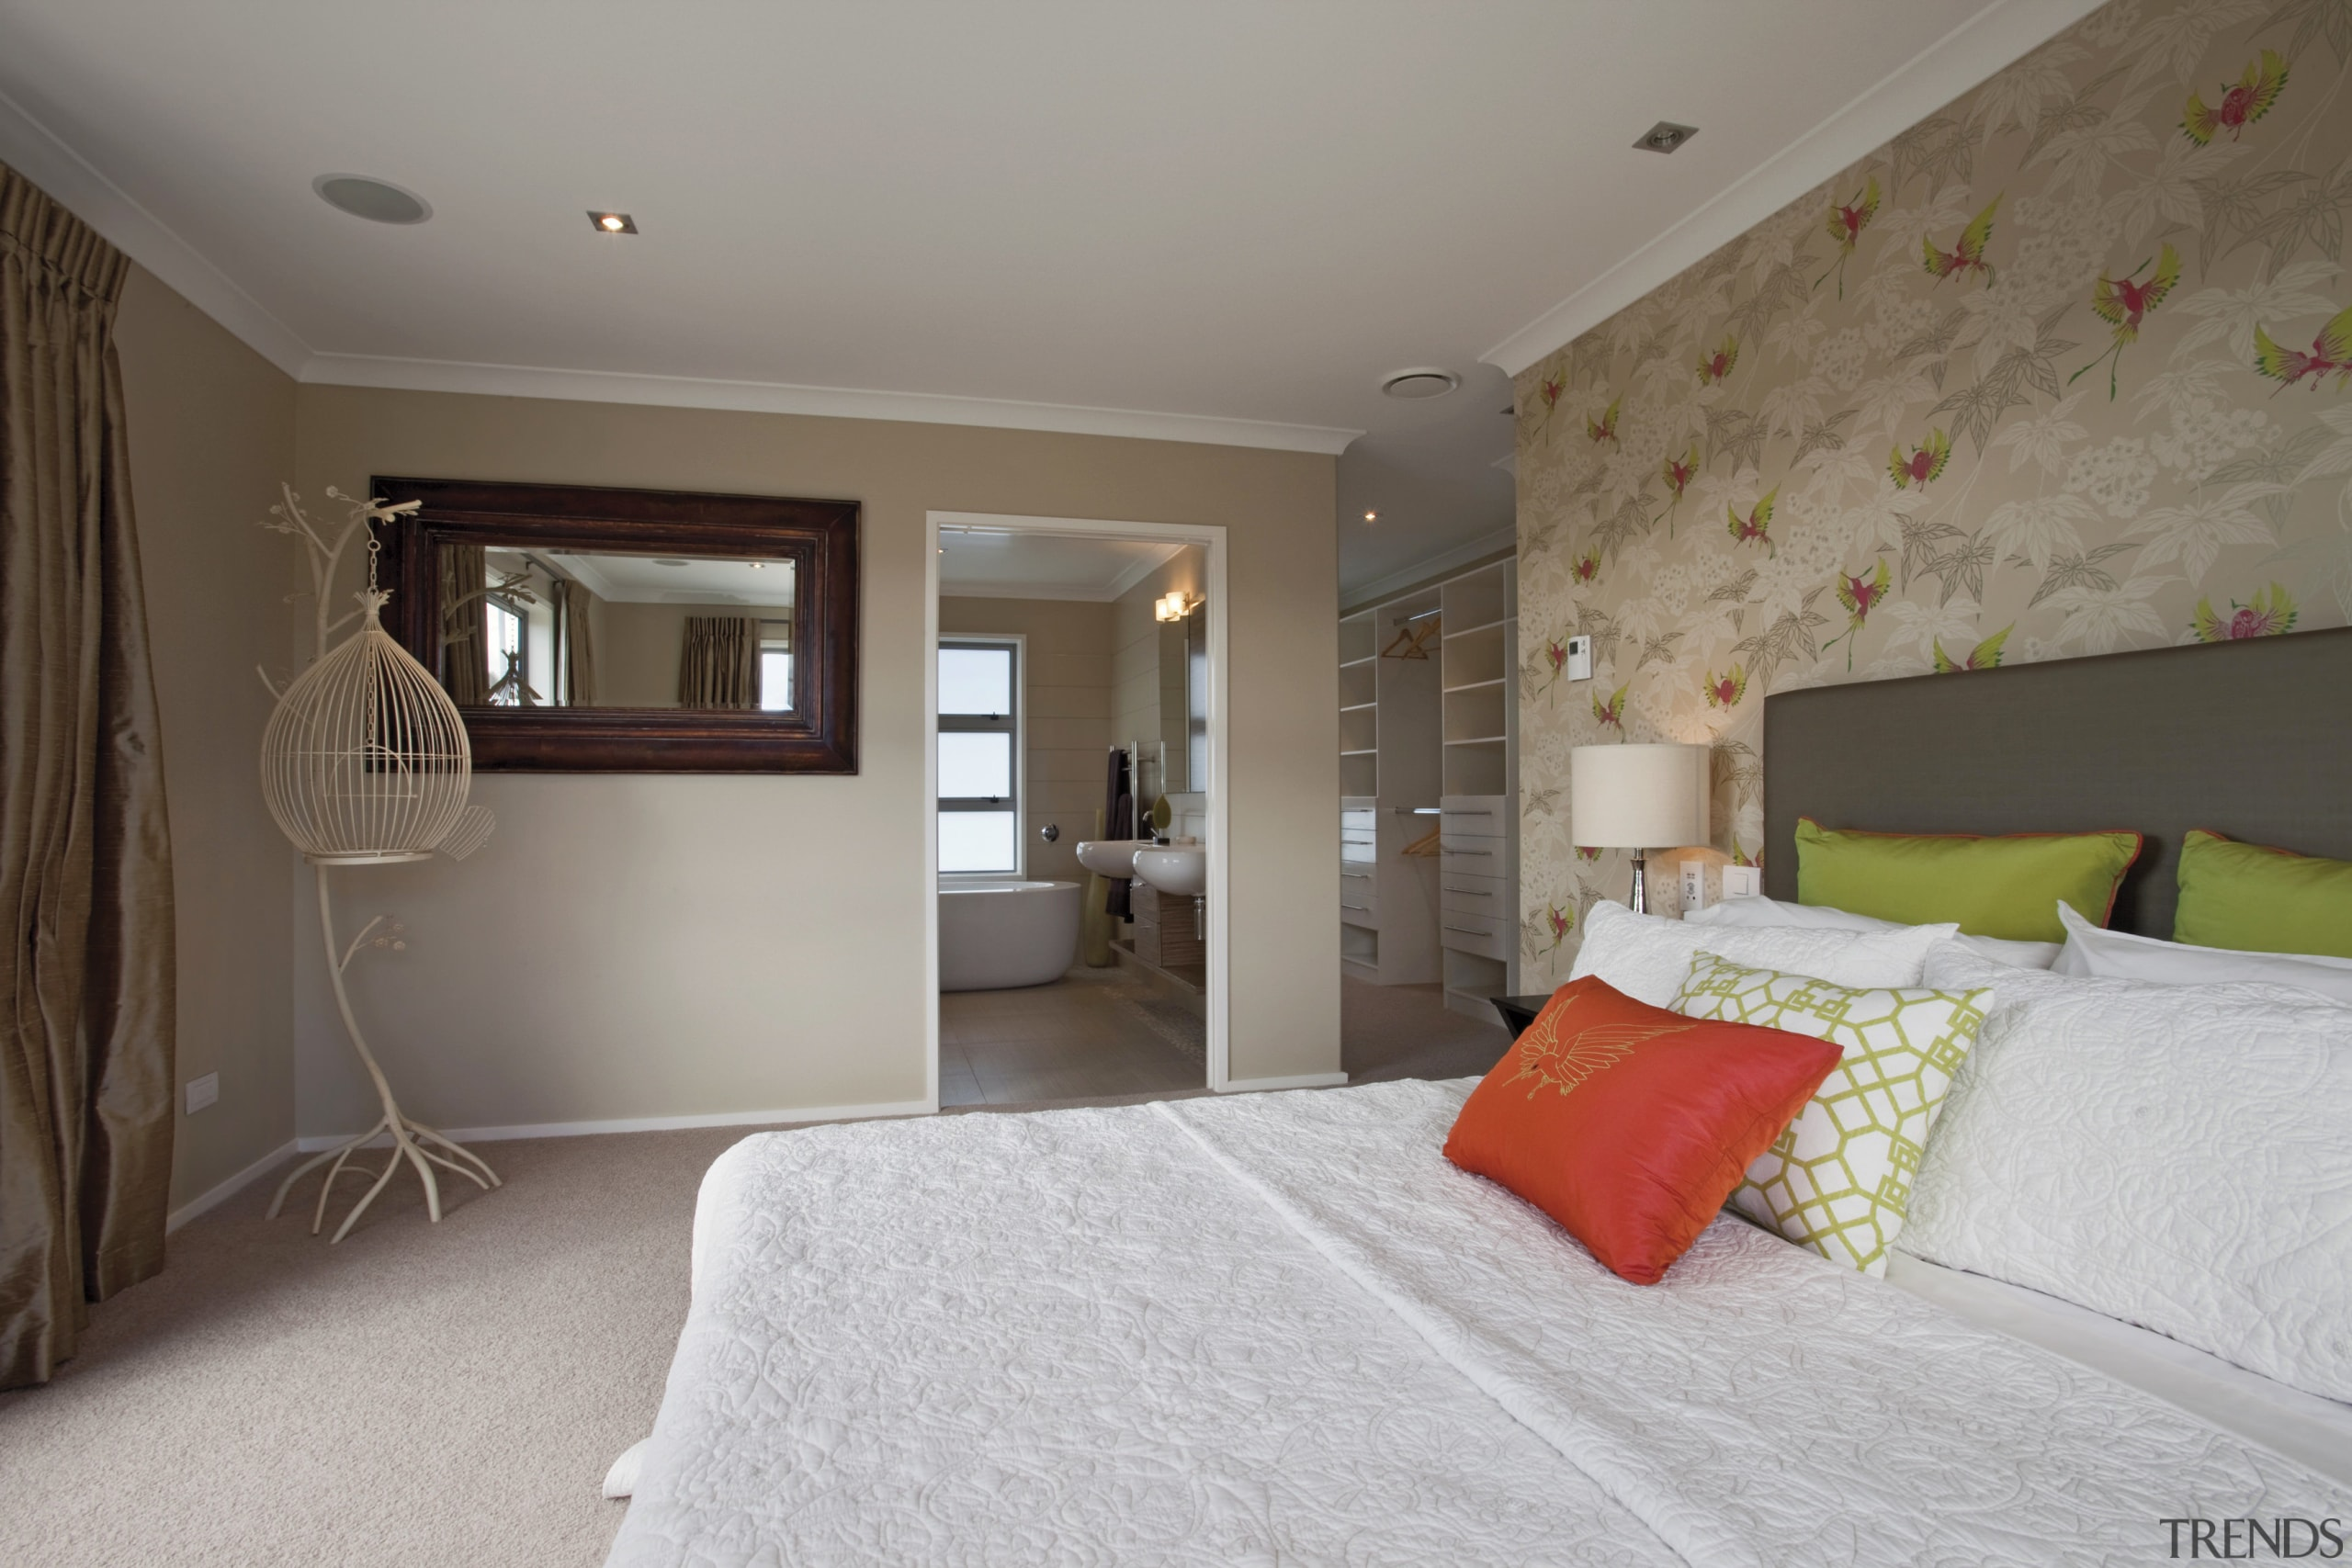 GJ Gardner Homes Lakes show home - GJ bedroom, ceiling, floor, home, interior design, property, real estate, room, wall, window, gray, brown